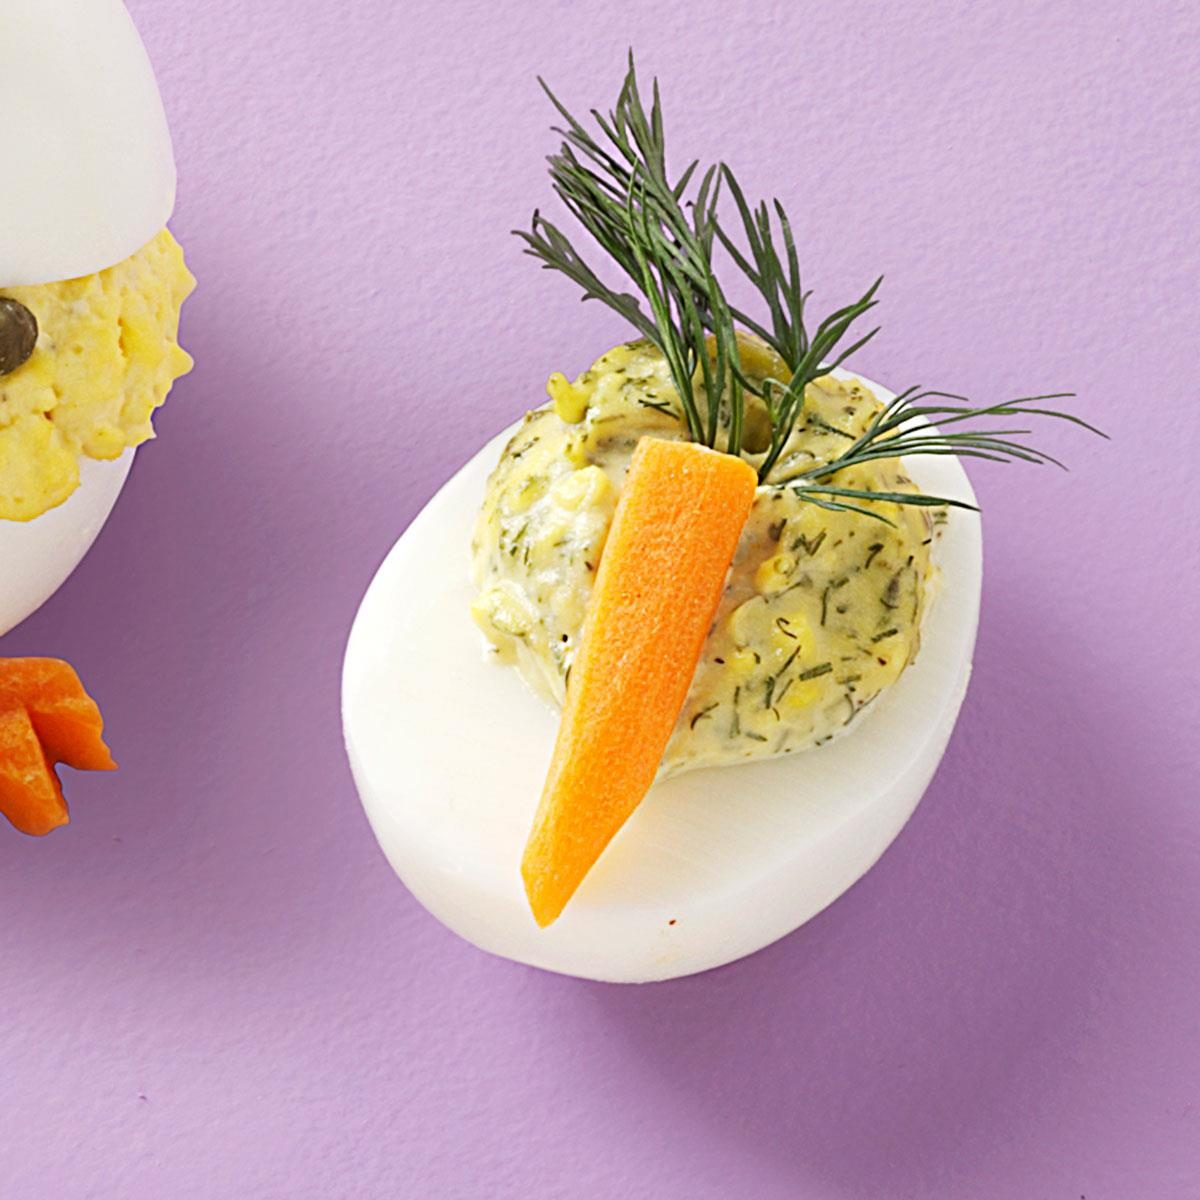 Dill-icious Deviled Eggs